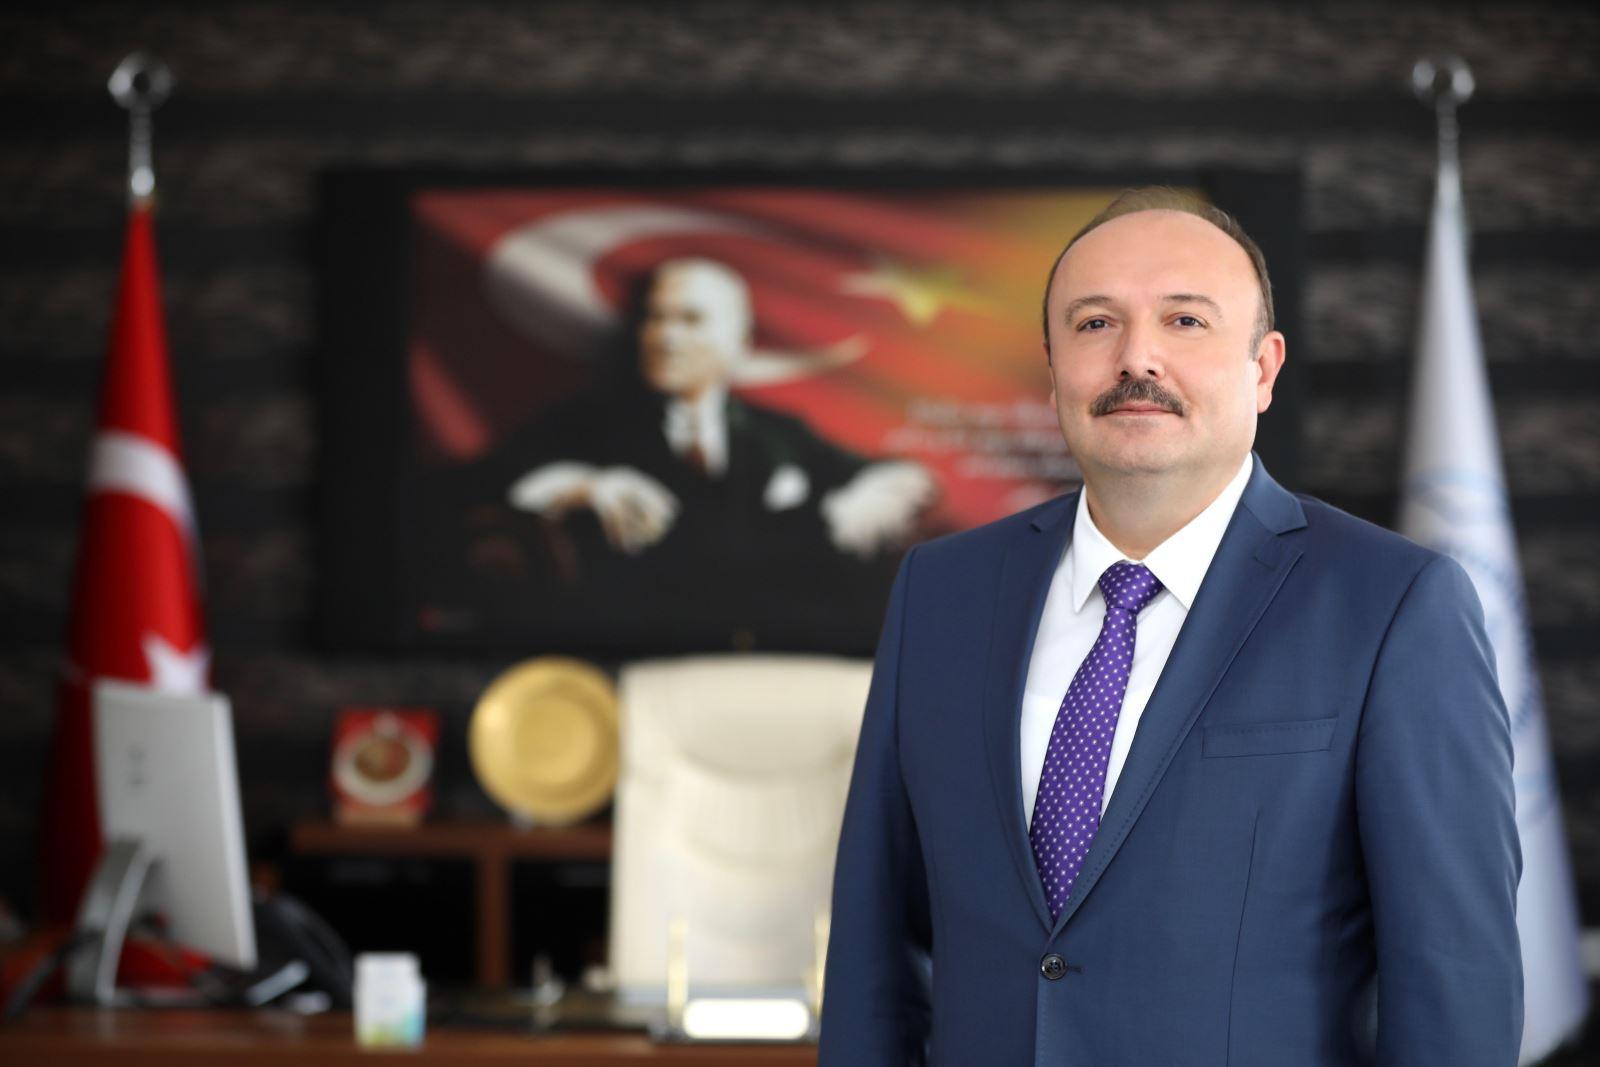 Bandırma Onyedi Eylül University's rector Prof Süleyman Özdemir